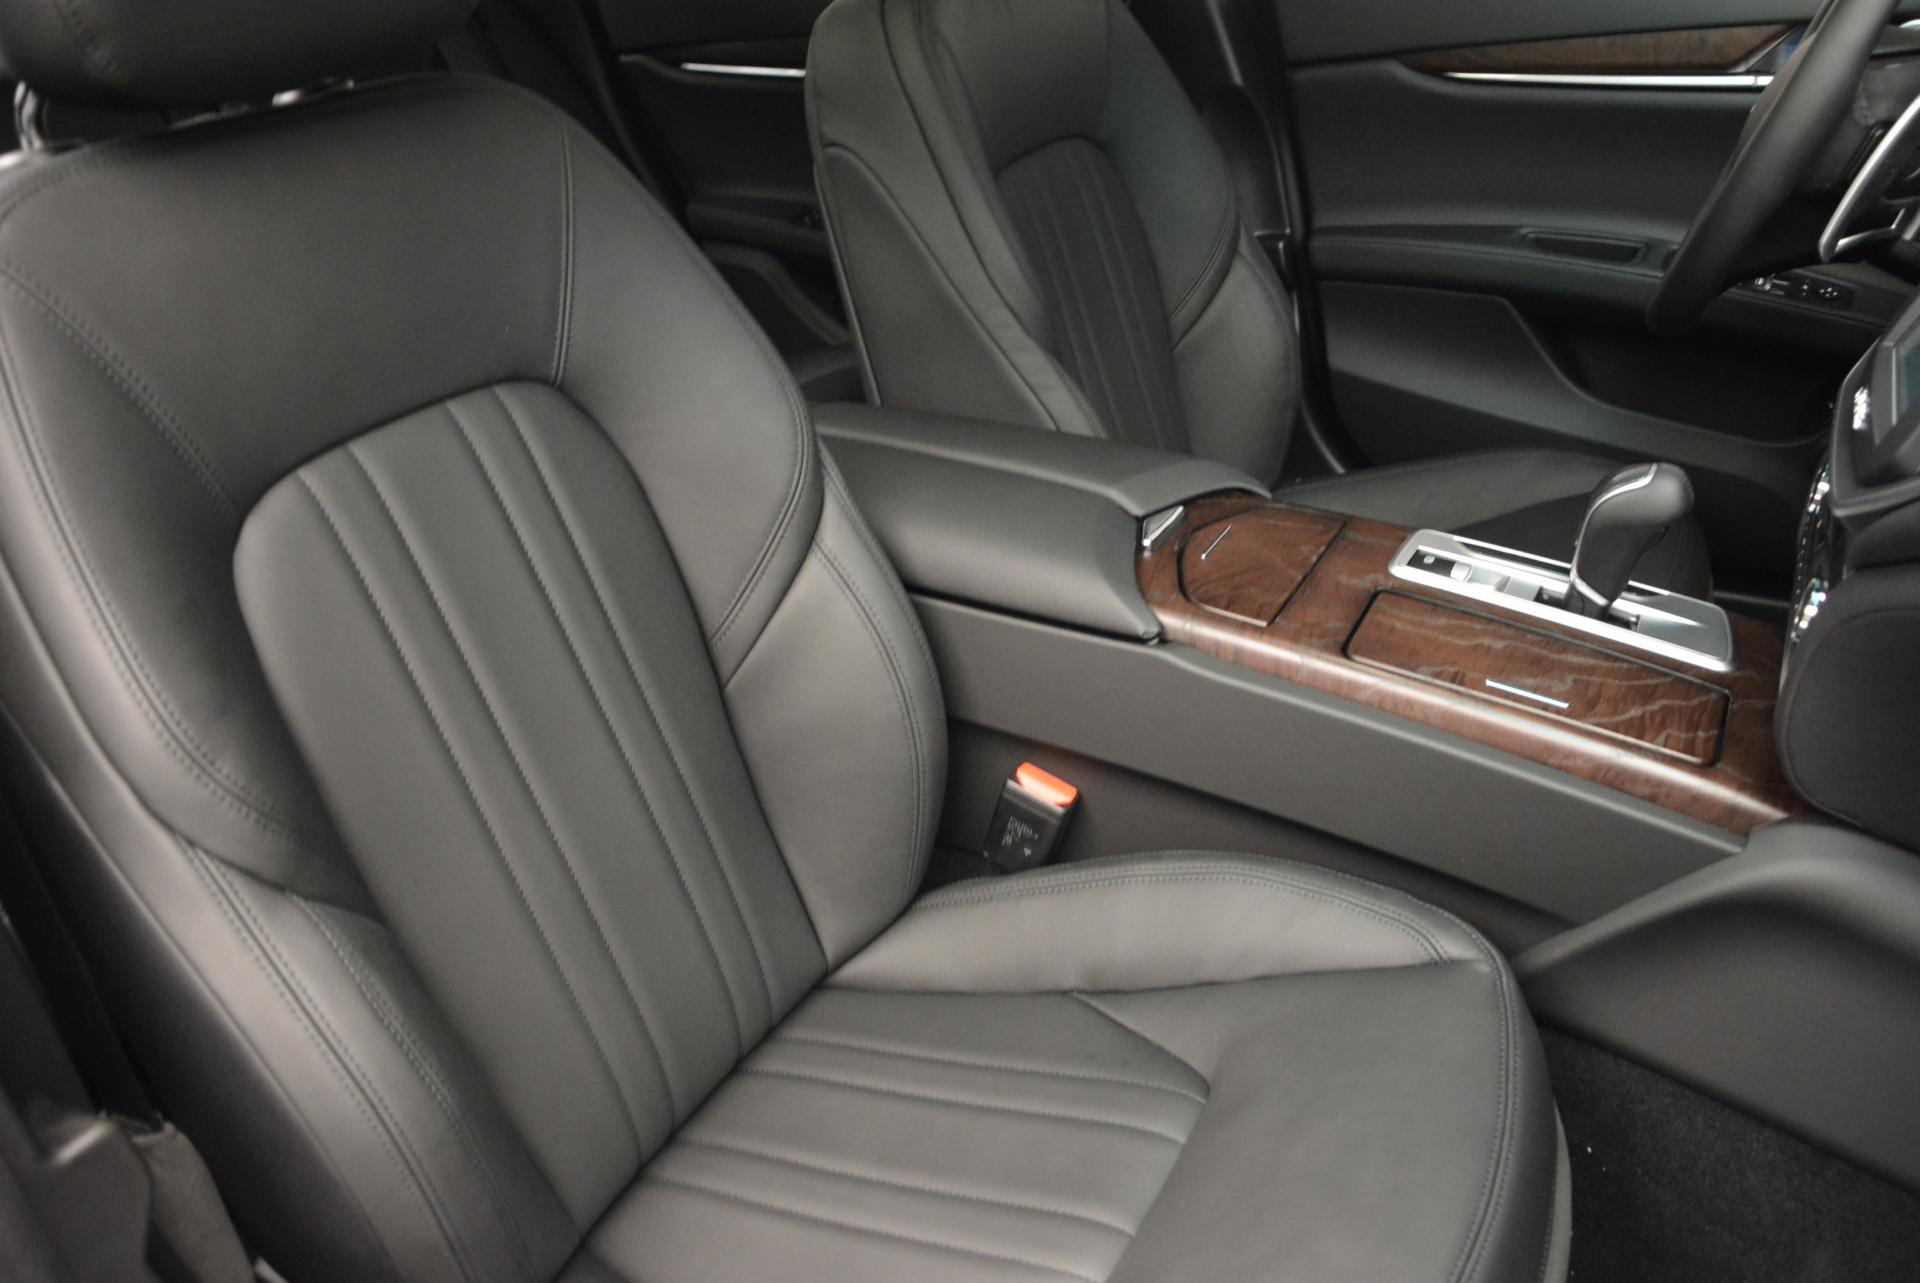 Used 2015 Maserati Ghibli S Q4 For Sale In Greenwich, CT 119_p19